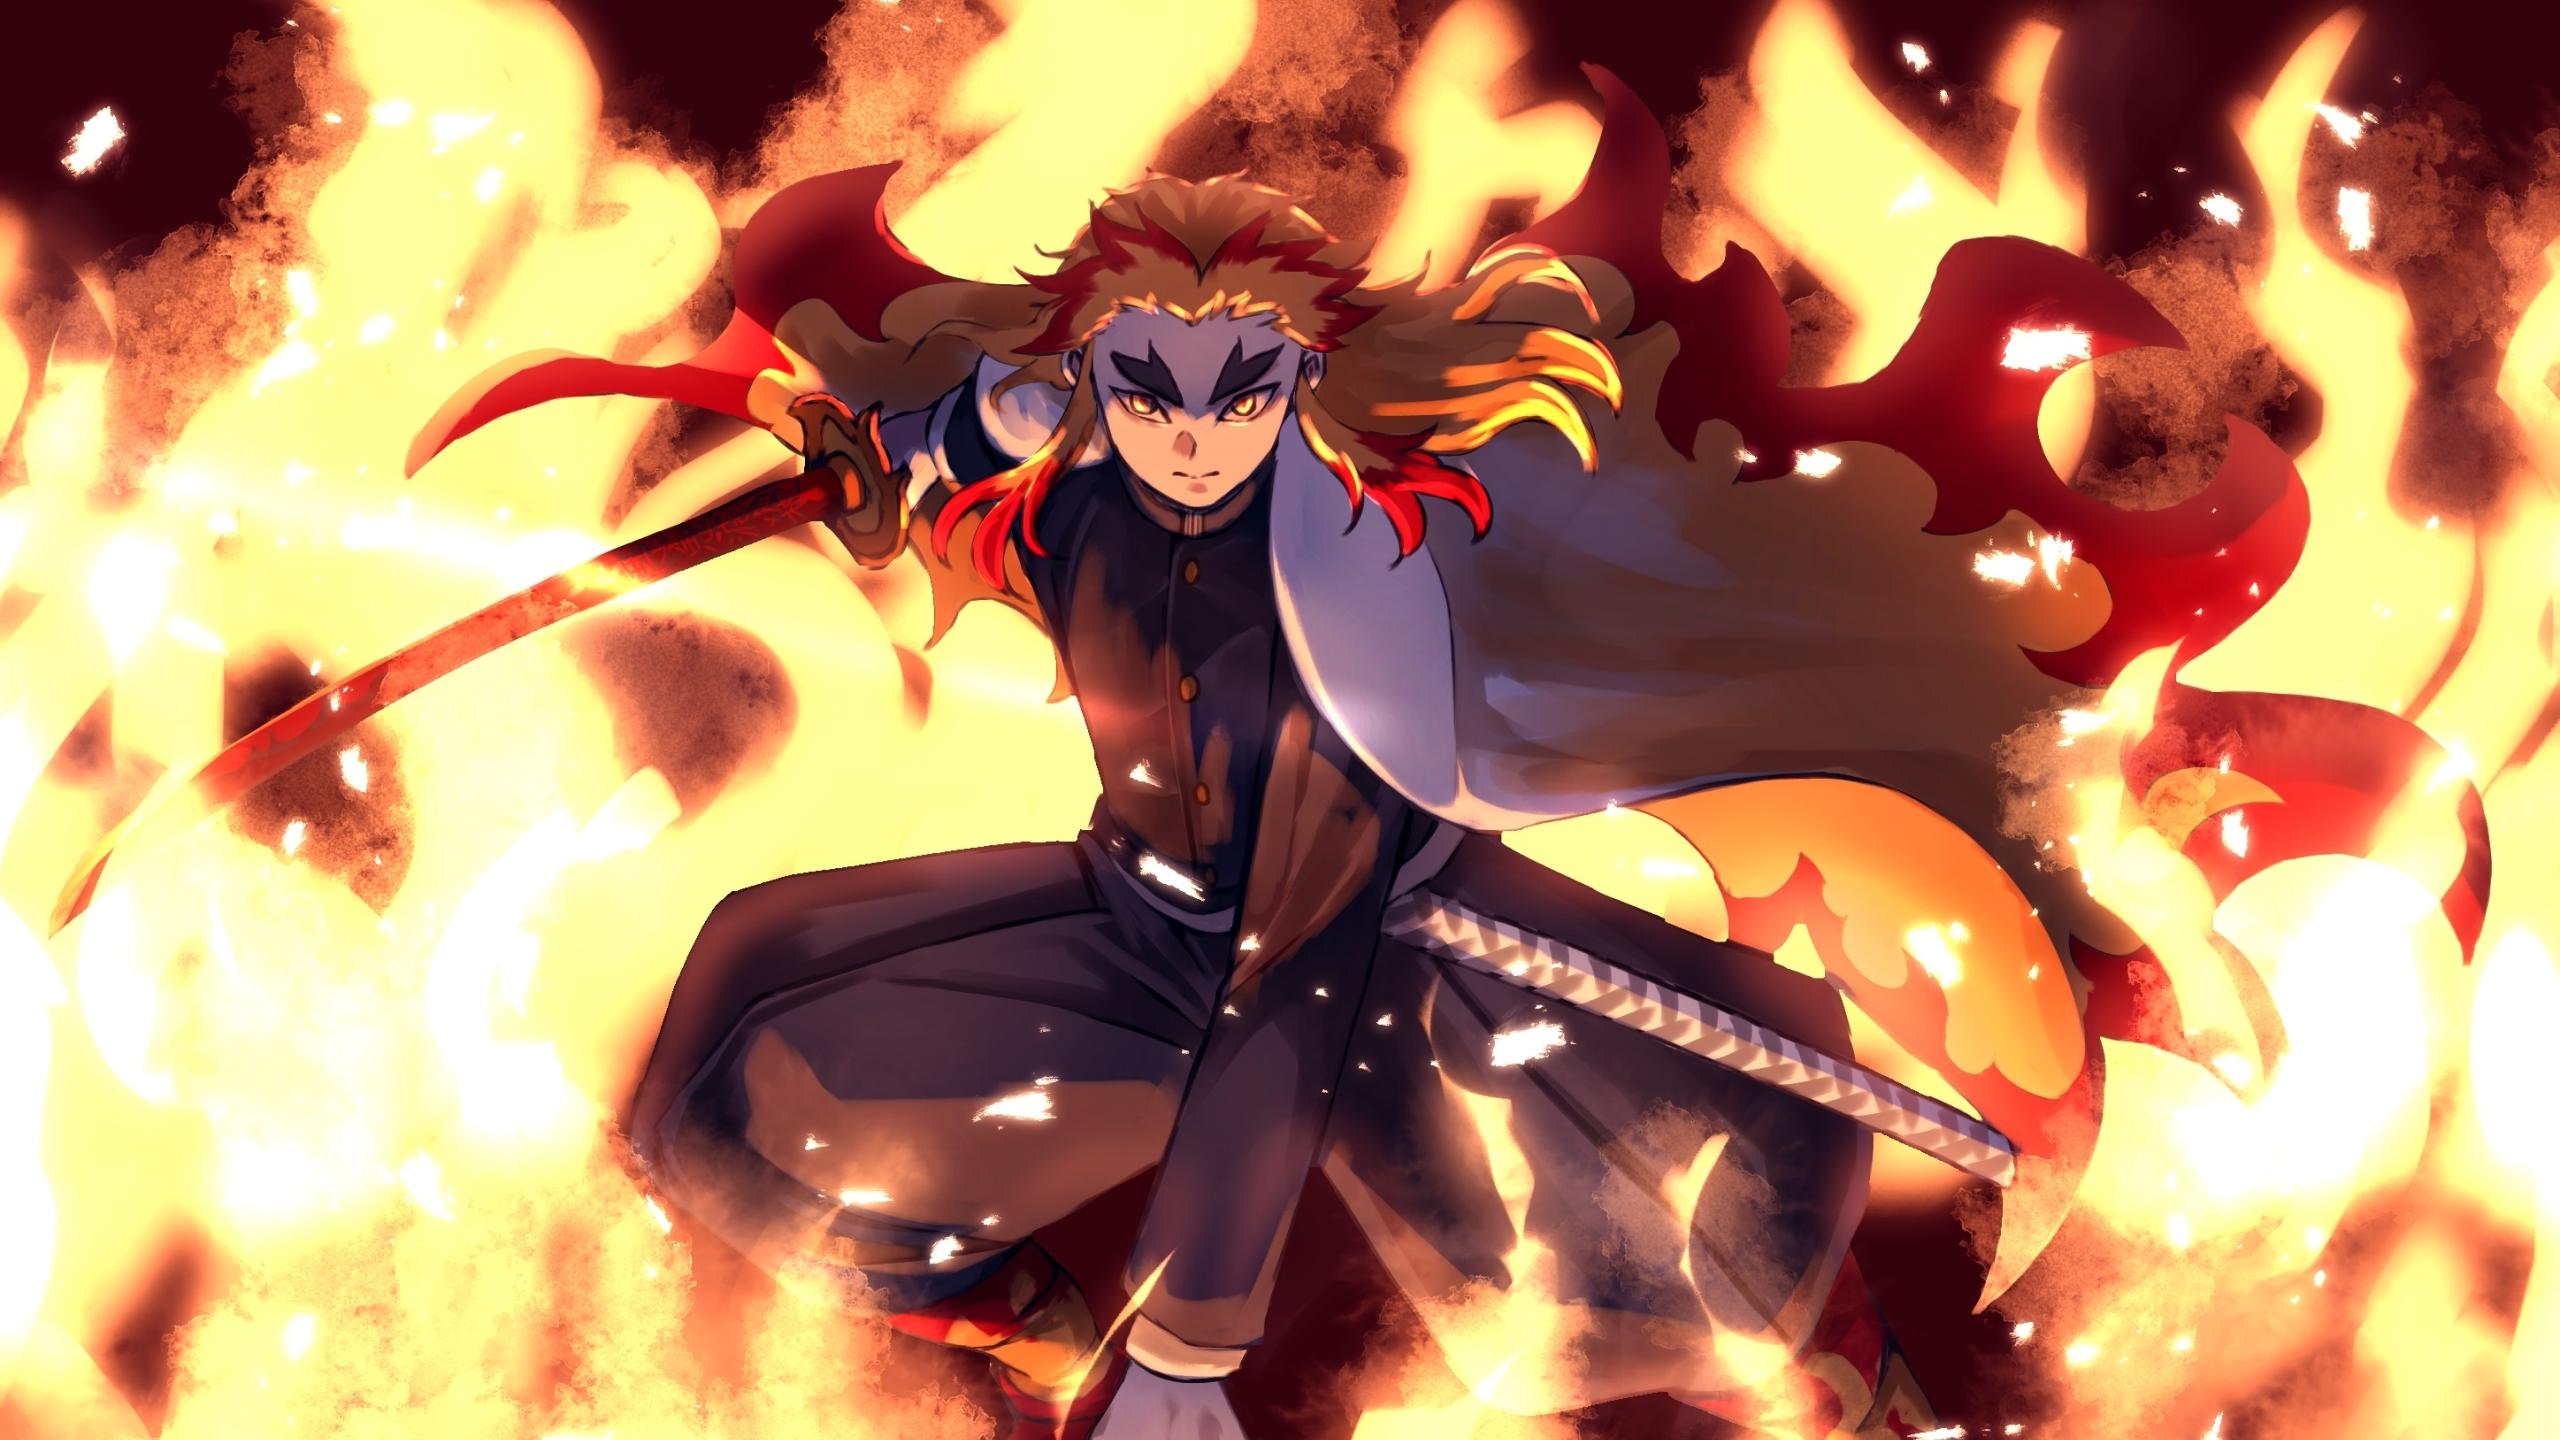 2560x1440 Kyojuro Rengoku From Demon Slayer 1440P ...